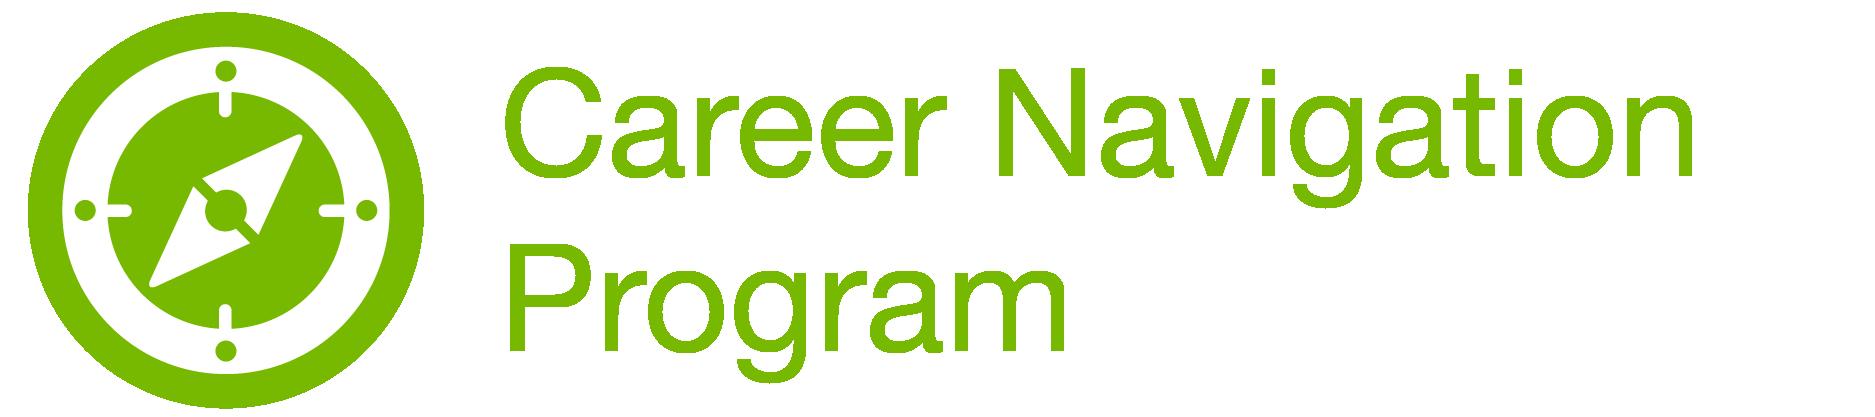 Goodwill Career Navigation Program